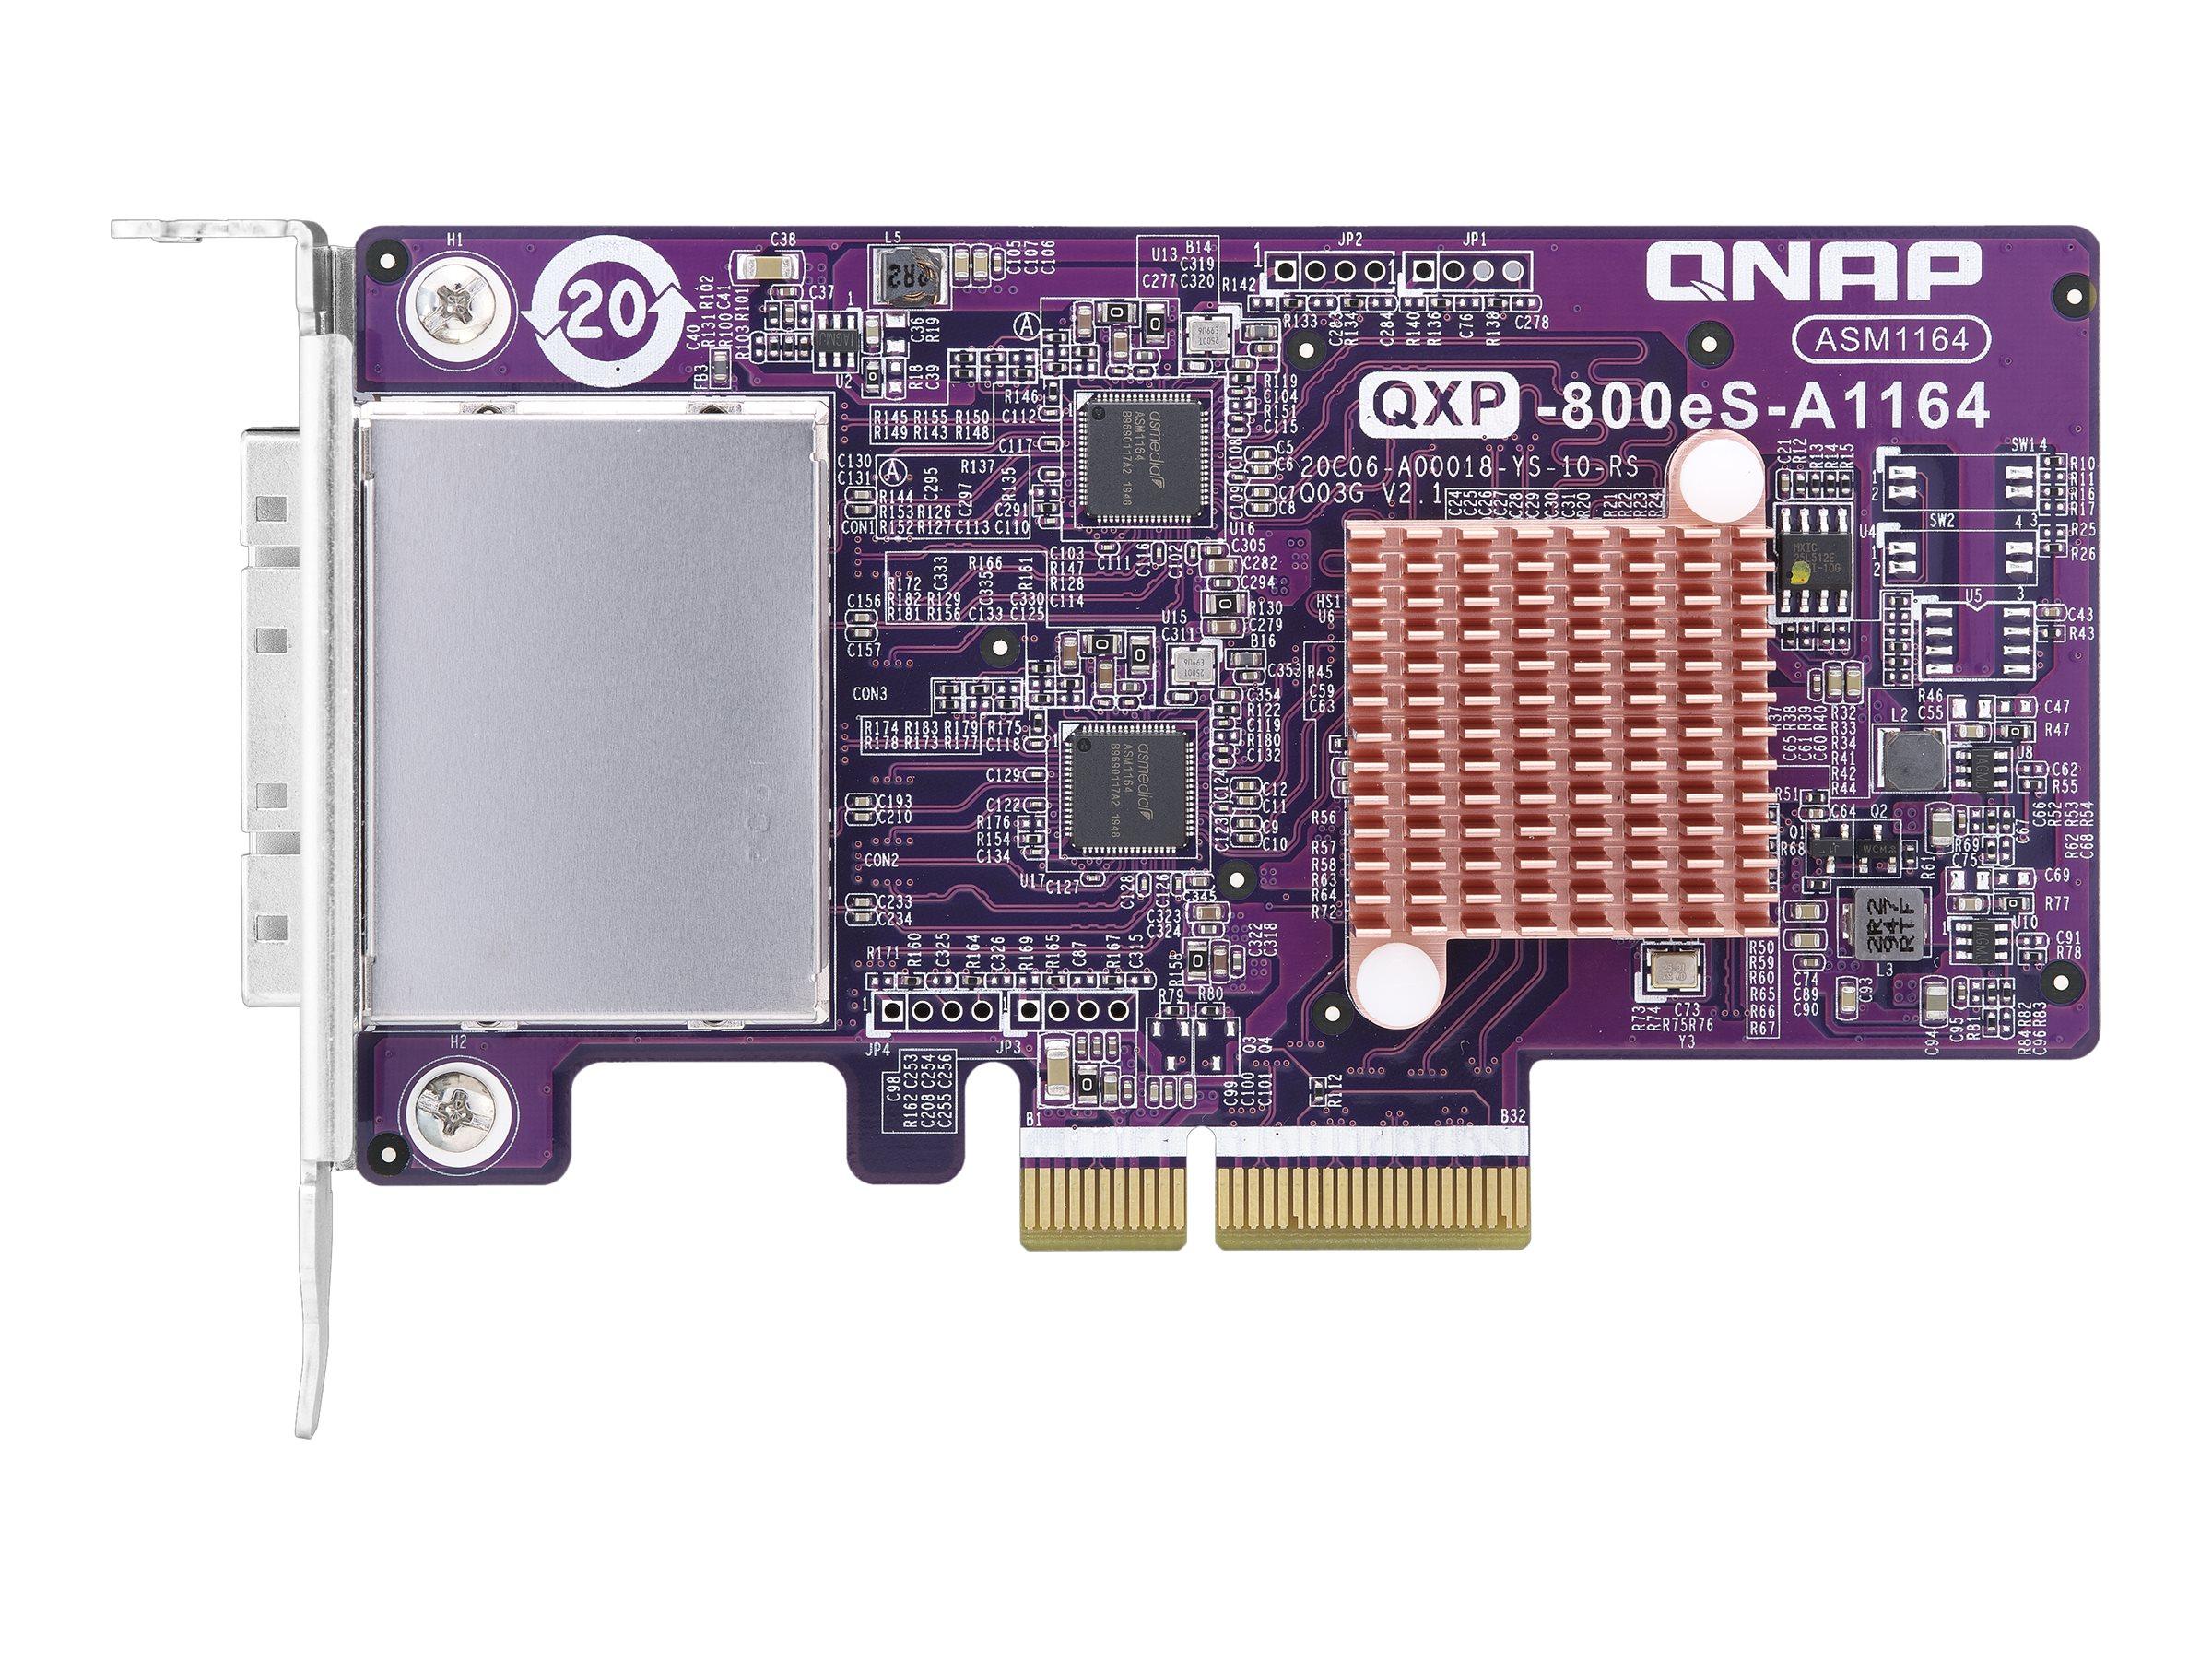 QNAP QXP SATA Expansion Card - storage controller - SATA 6Gb/s / SAS 6Gb/s - PCIe 3.0 x4